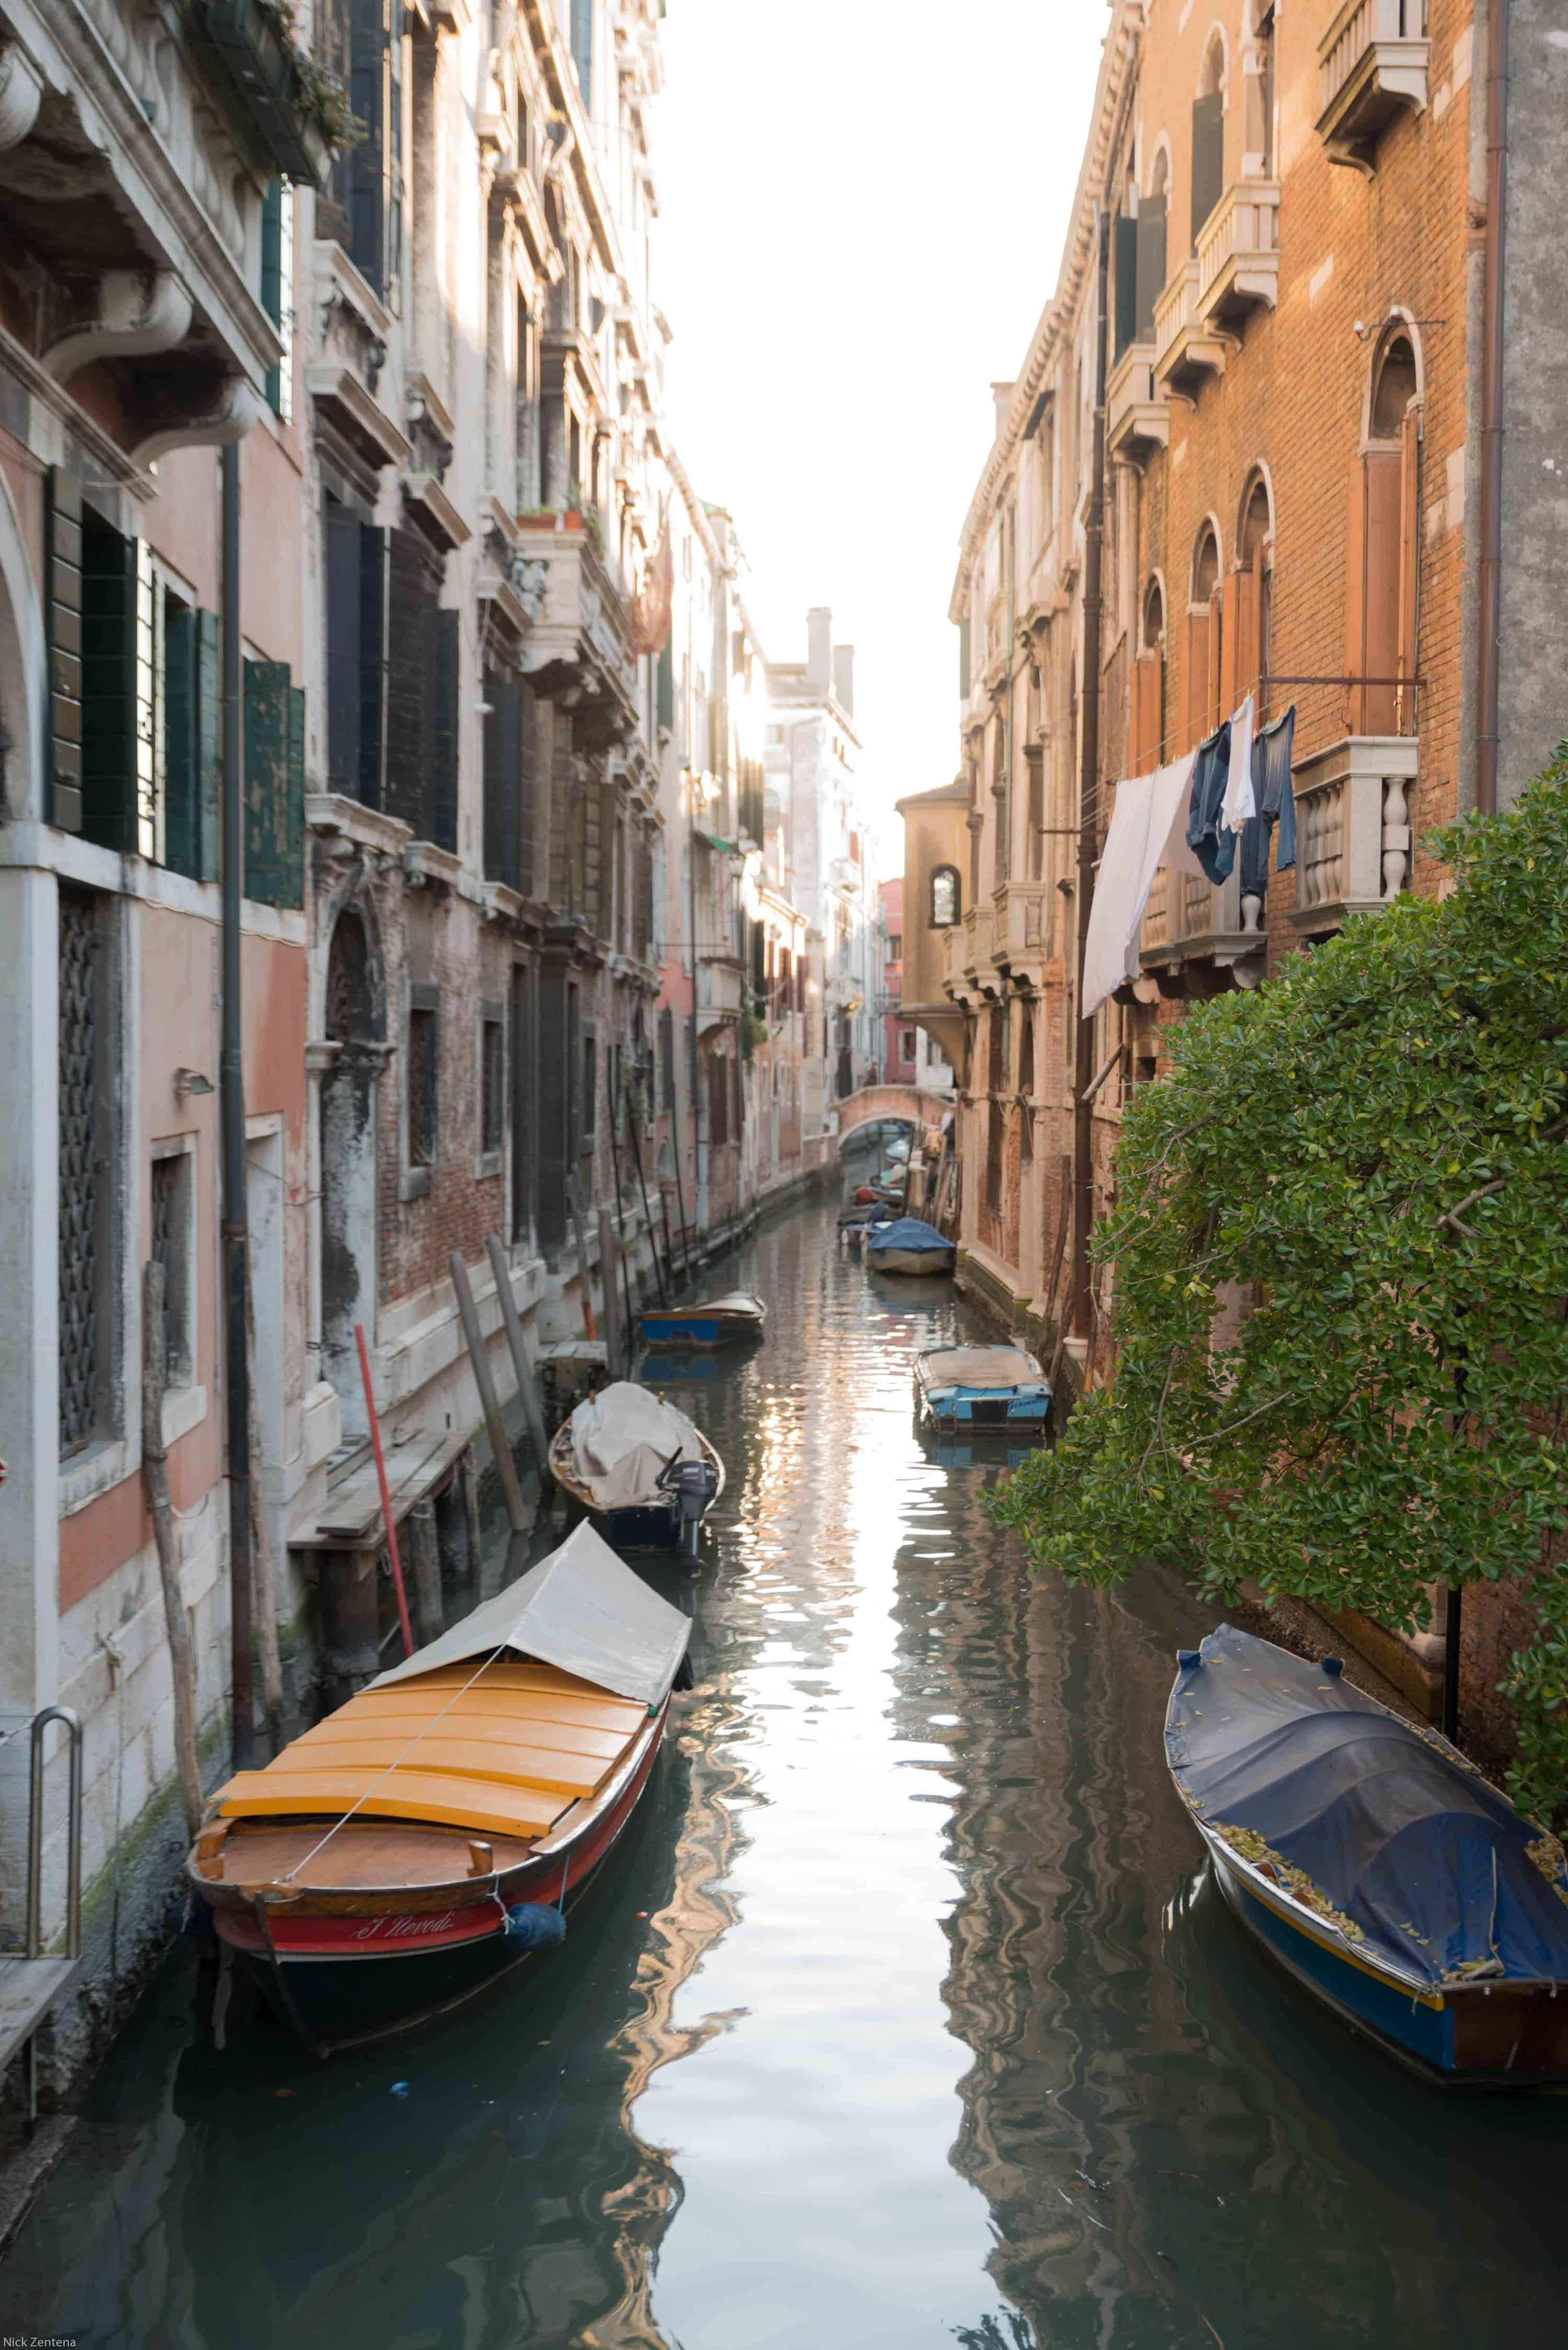 Italy in photographs Venetian canal during acqua bassa